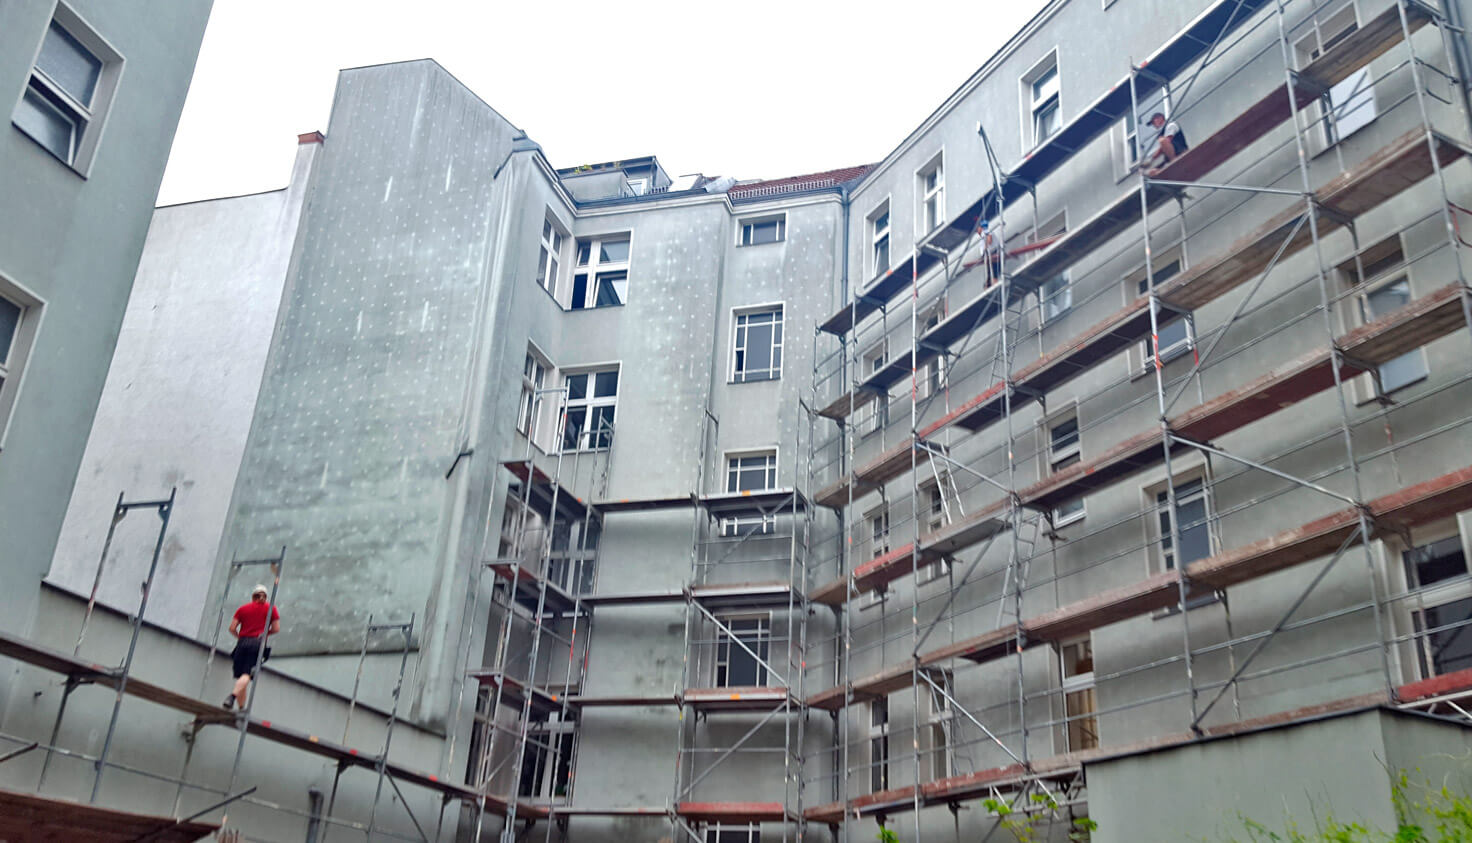 Malplaquetstraße Fassade - Referenz Malerbetrieb Kluge Berlin